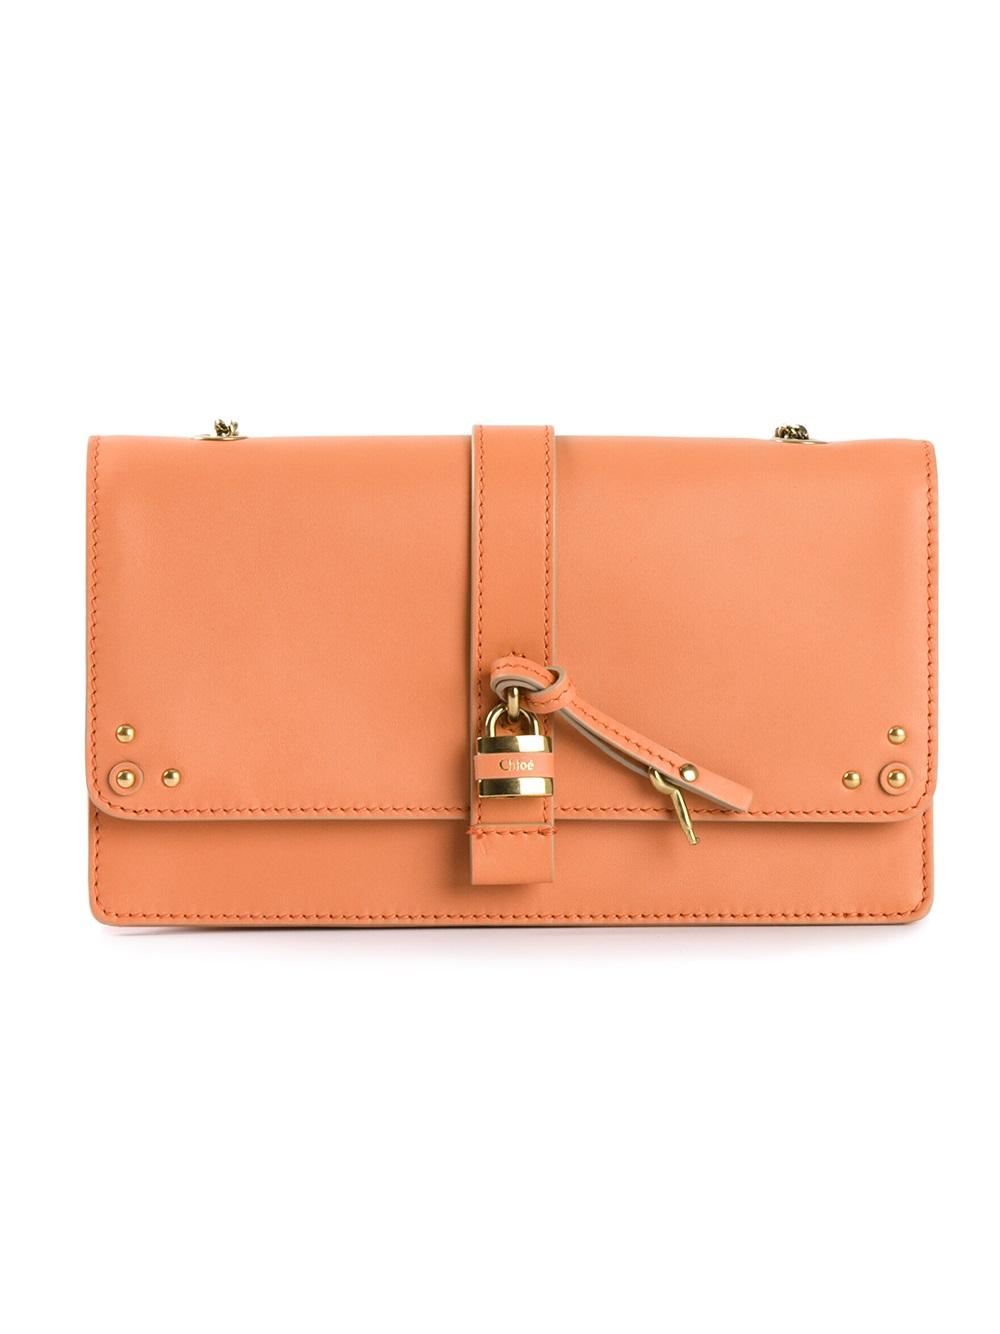 Chlo¨¦ \u0026#39;paddington\u0026#39; Crossbody Bag in Orange (yellow \u0026amp; orange) | Lyst